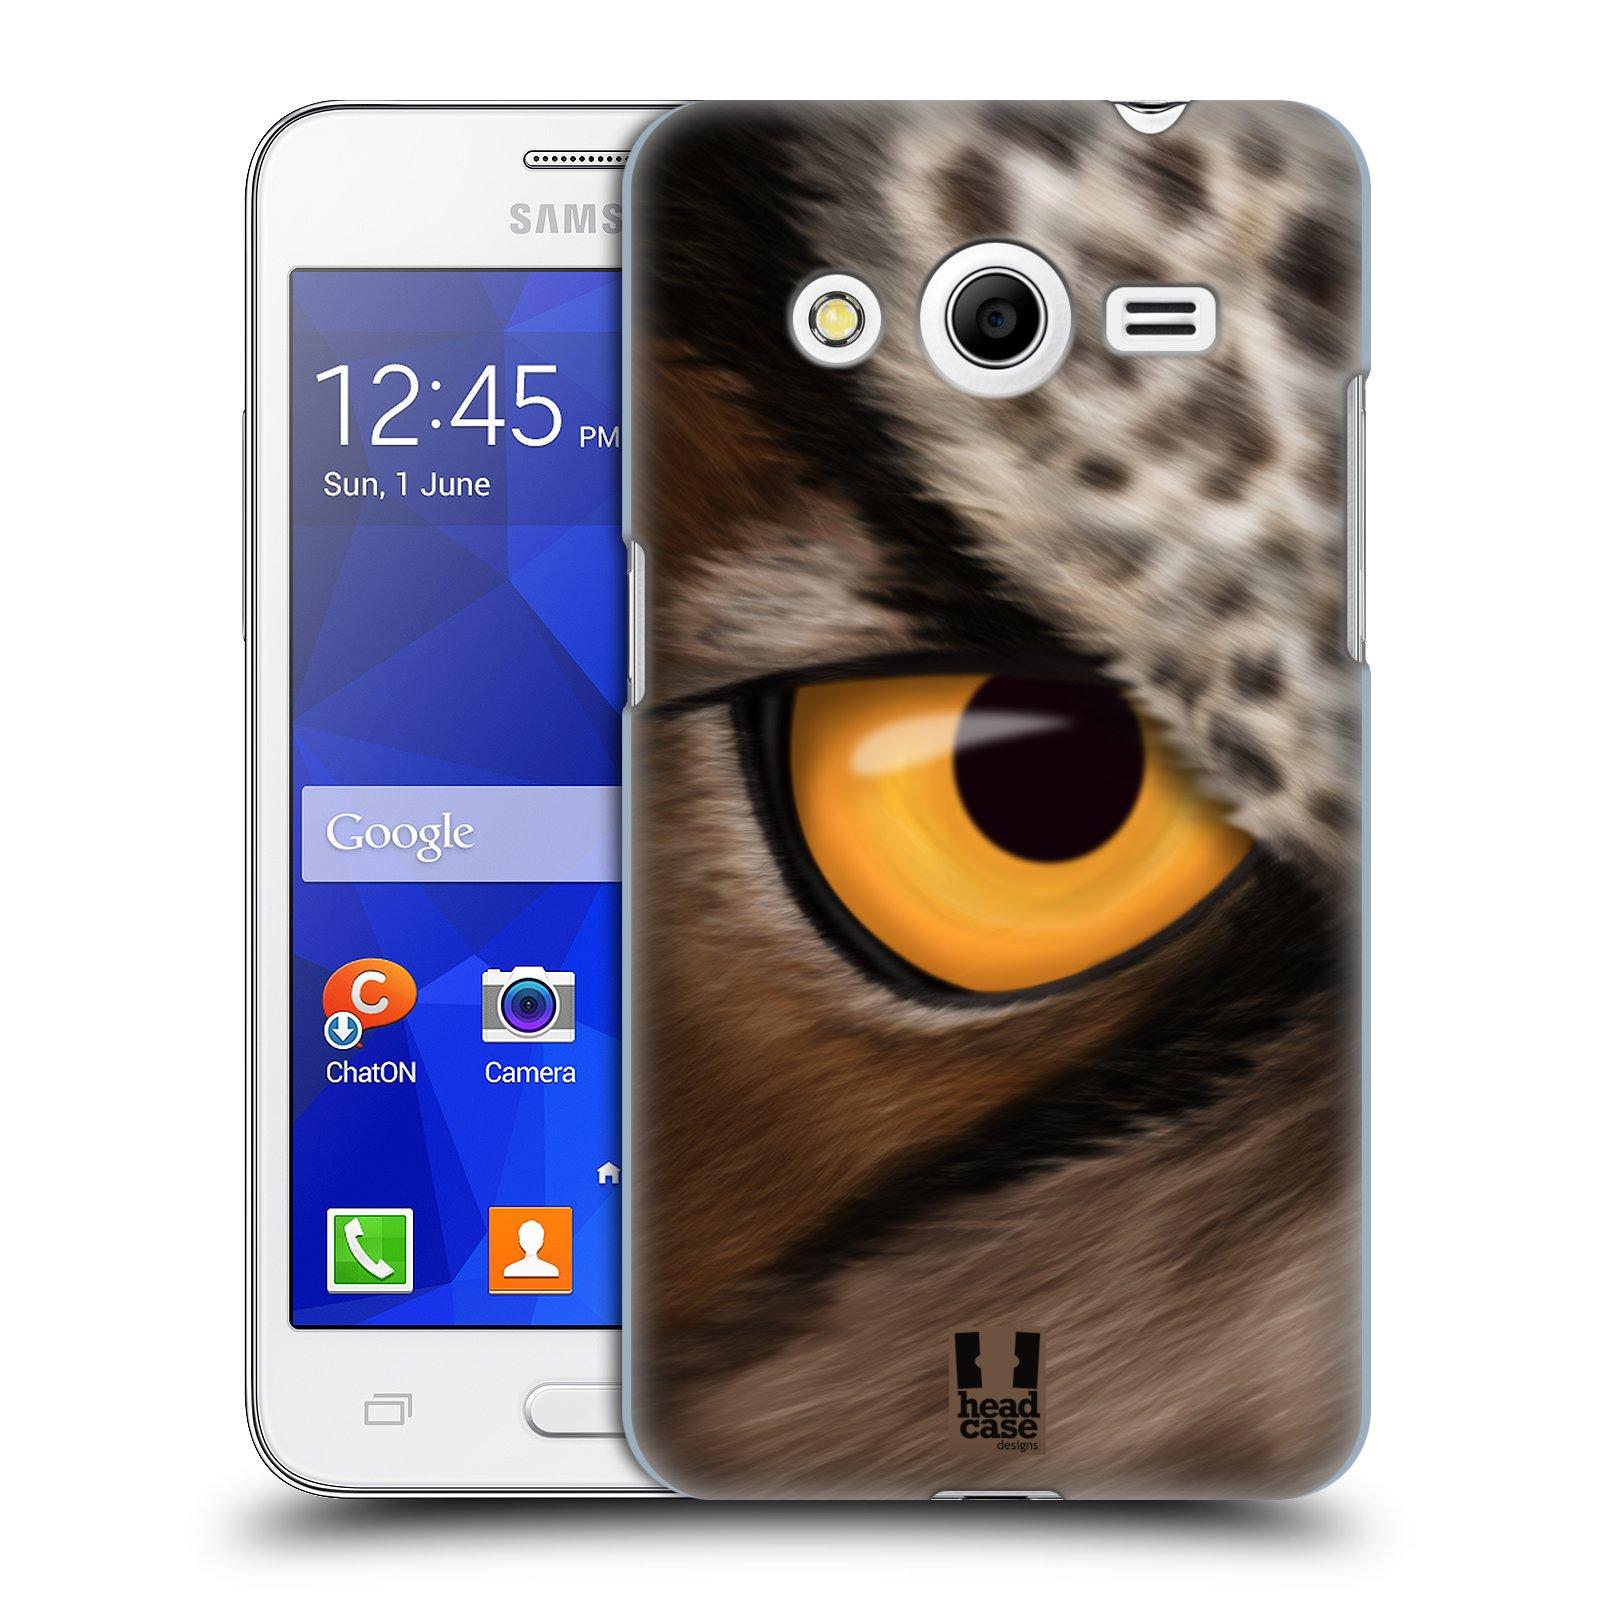 HEAD CASE plastový obal na mobil SAMSUNG GALAXY Core 2 (G355H) vzor pohled zvířete oko sova